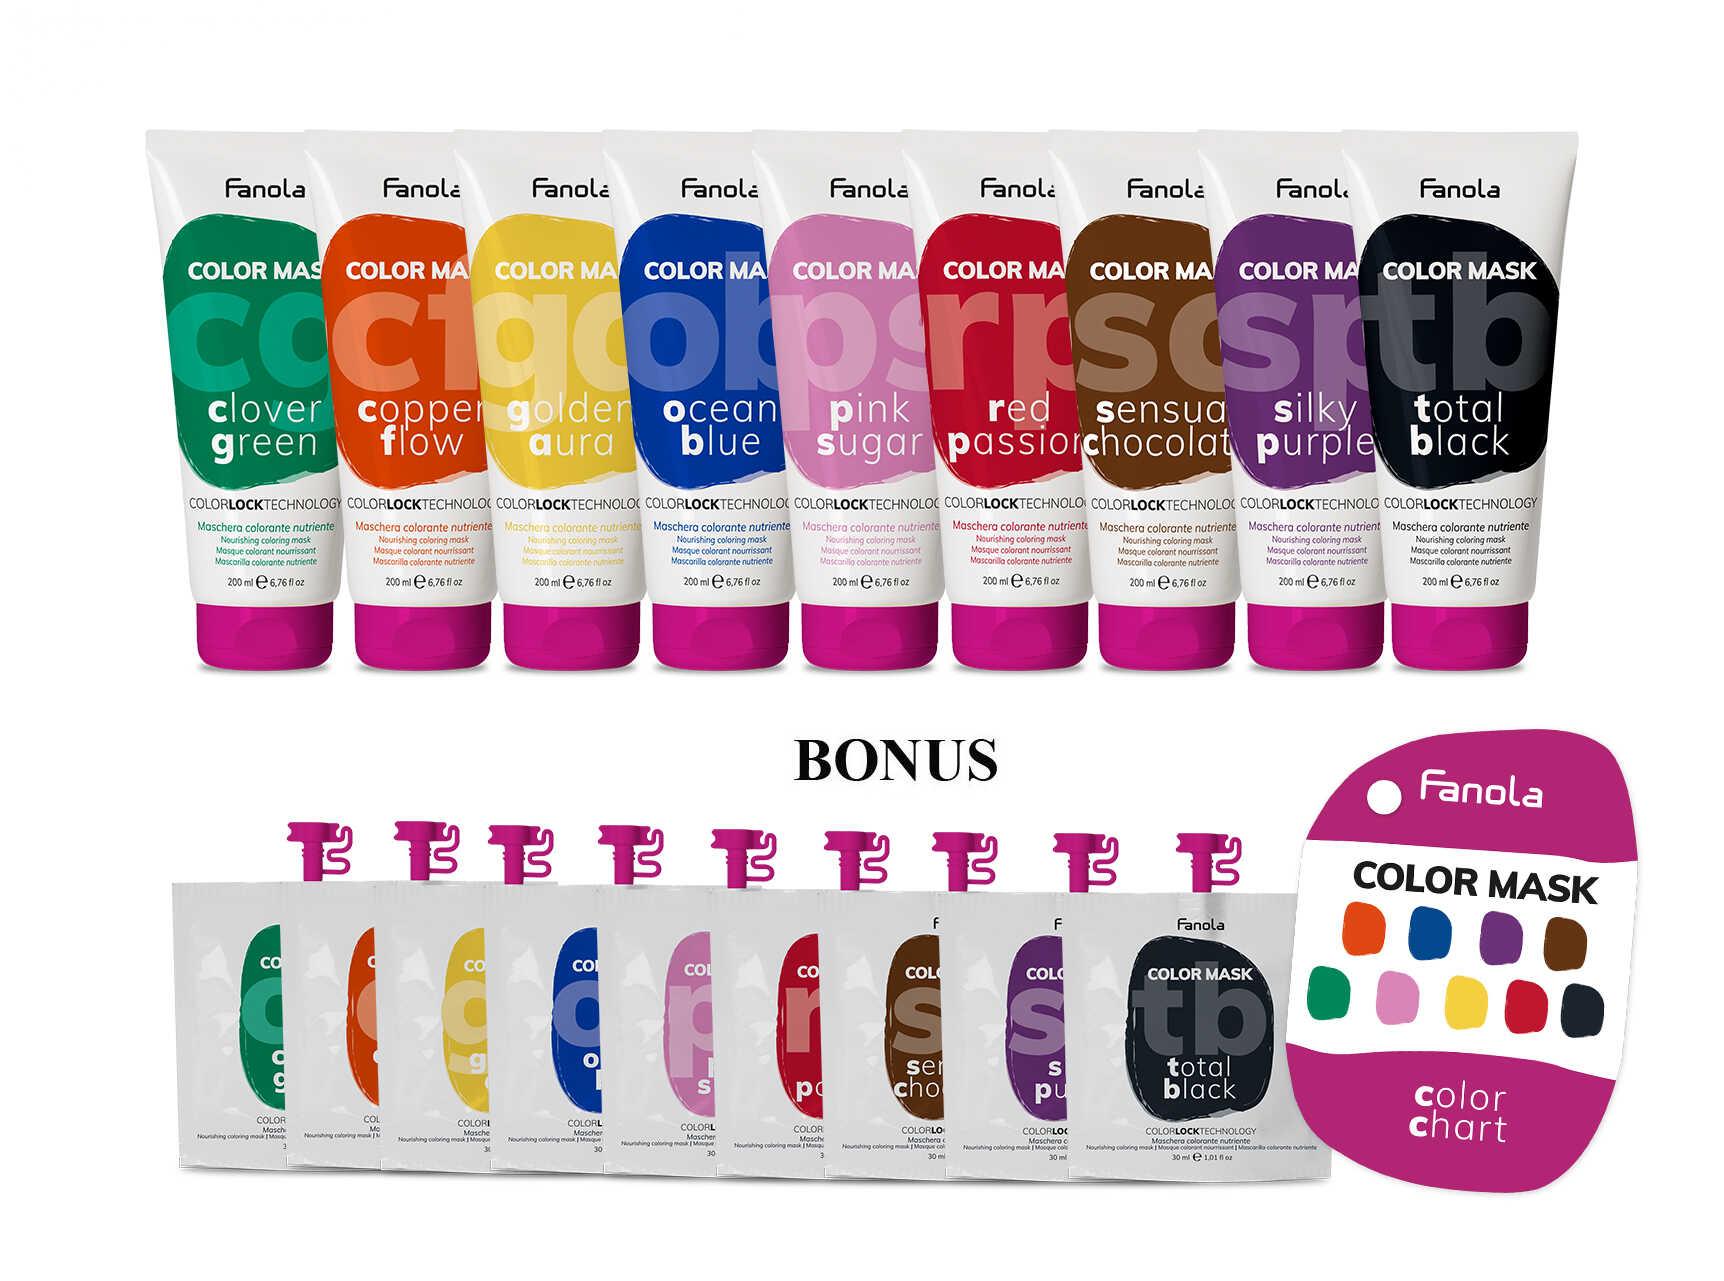 AKCIA: 9x Fanola Color Mask - farebná maska, 200 ml + 9x Fanola Color Mask - farebná maska, 30 ml a vzorkovník Color Mask